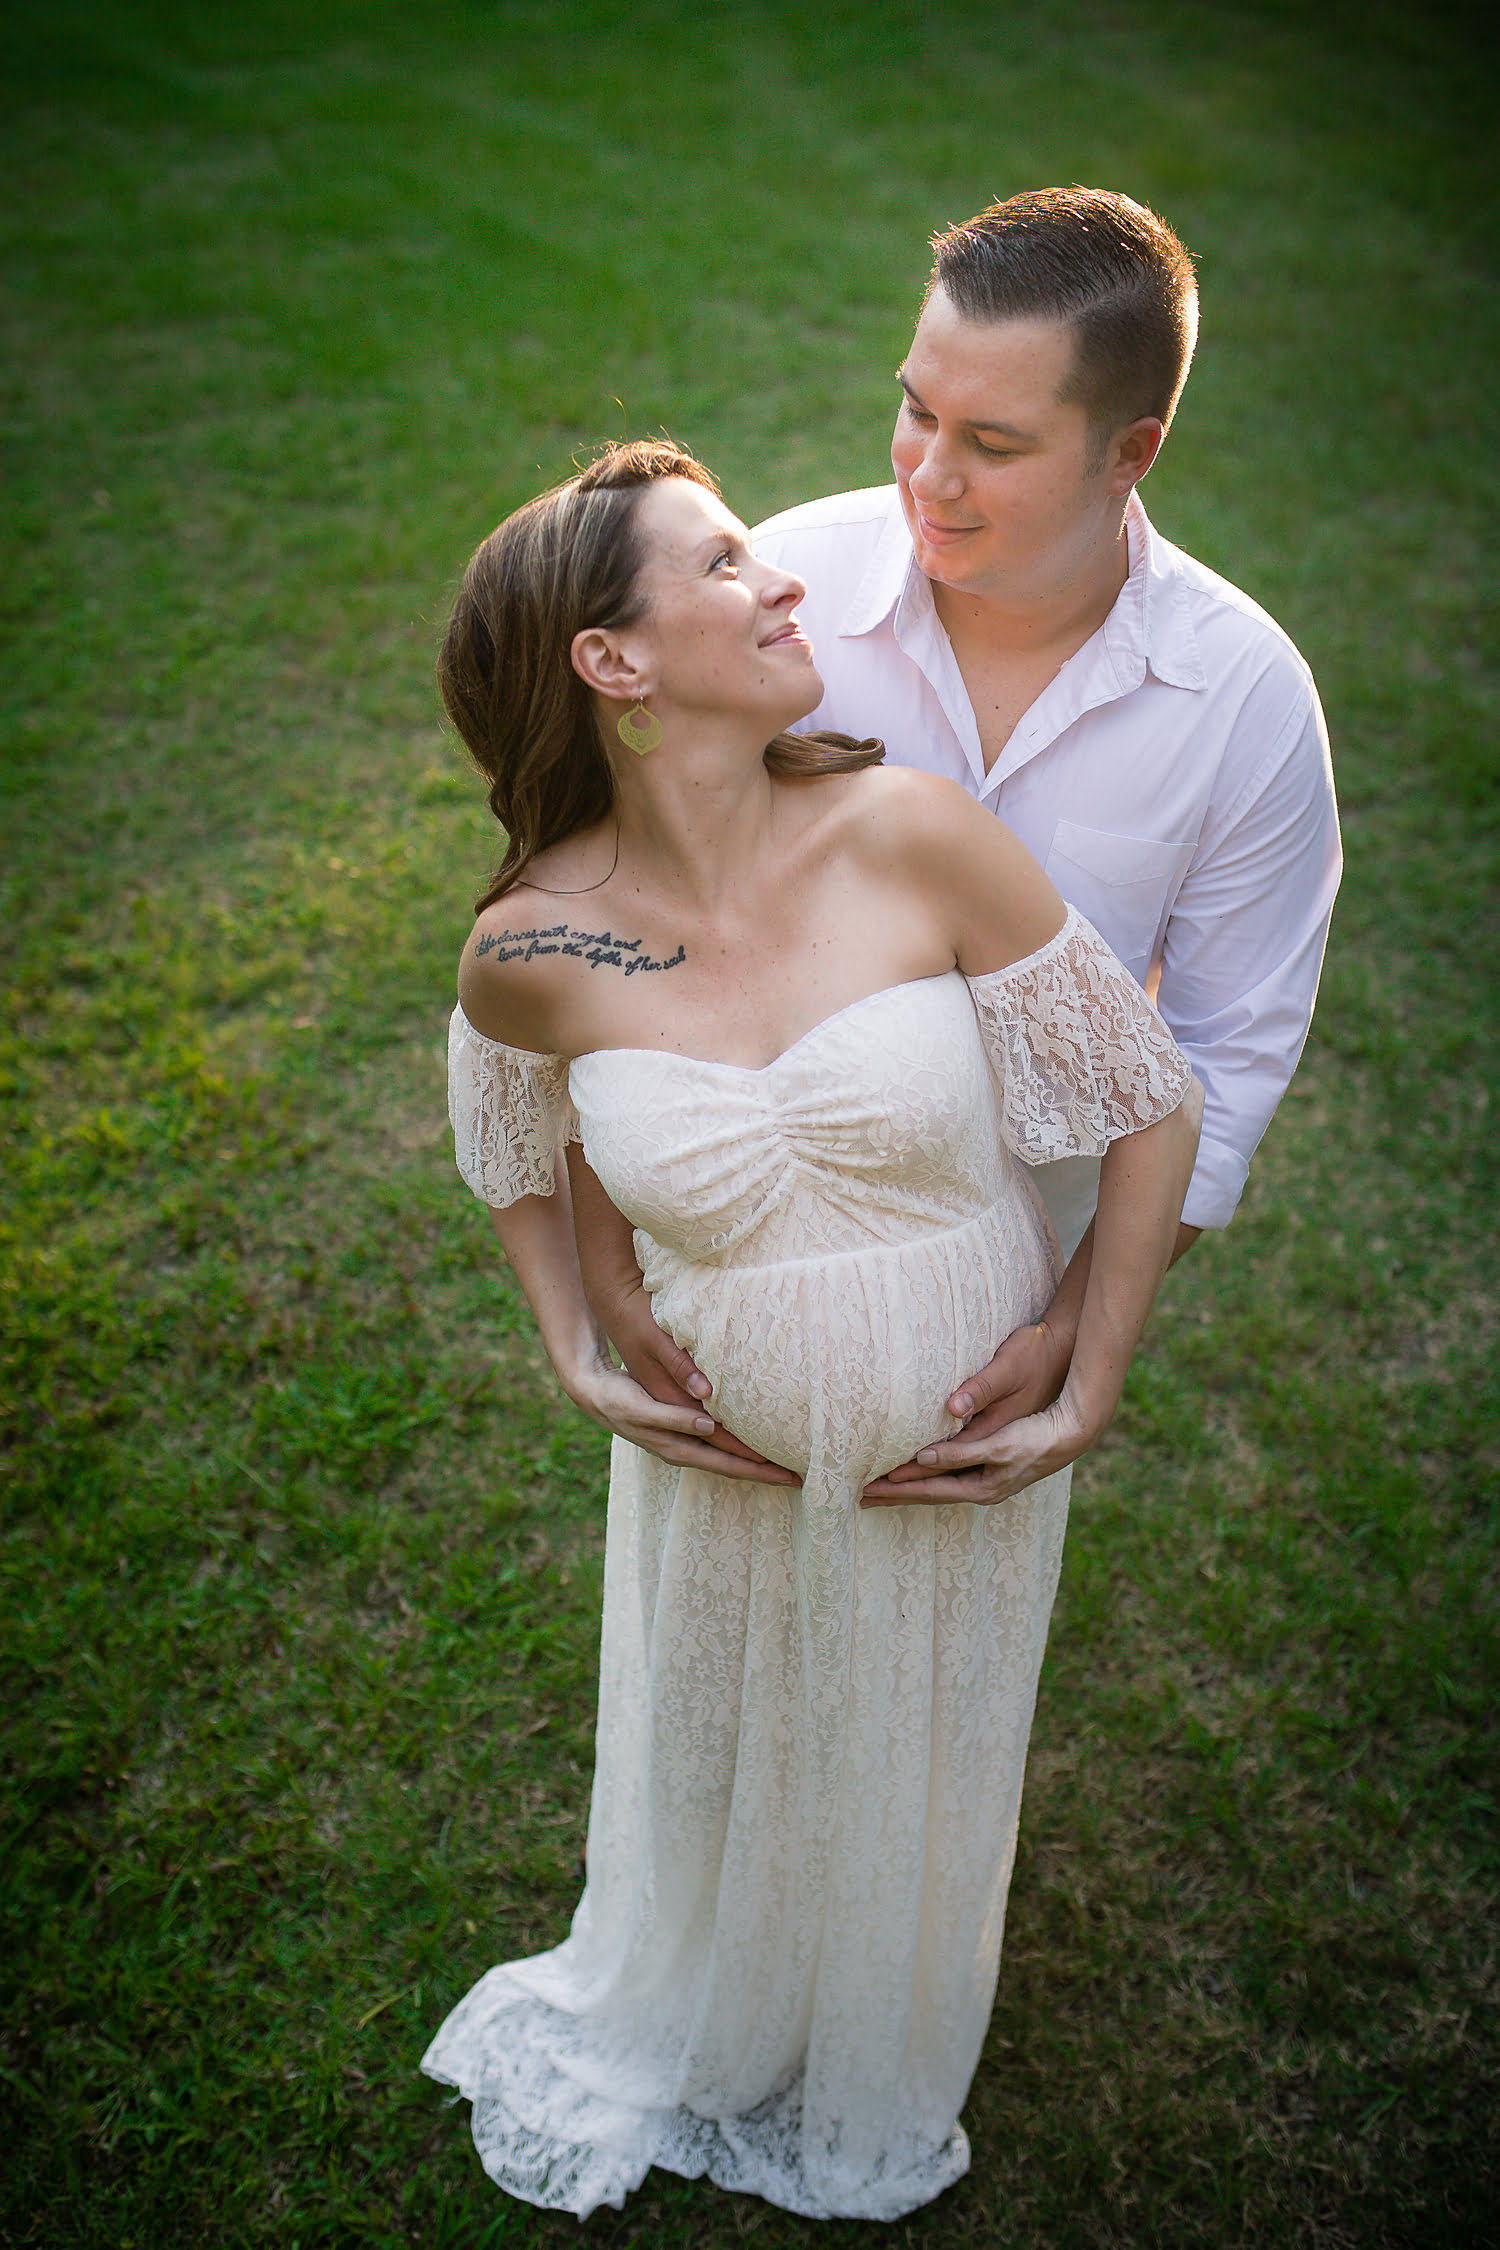 Maternity photo taken by Lisa Rowland Photography in Trenton, Florida